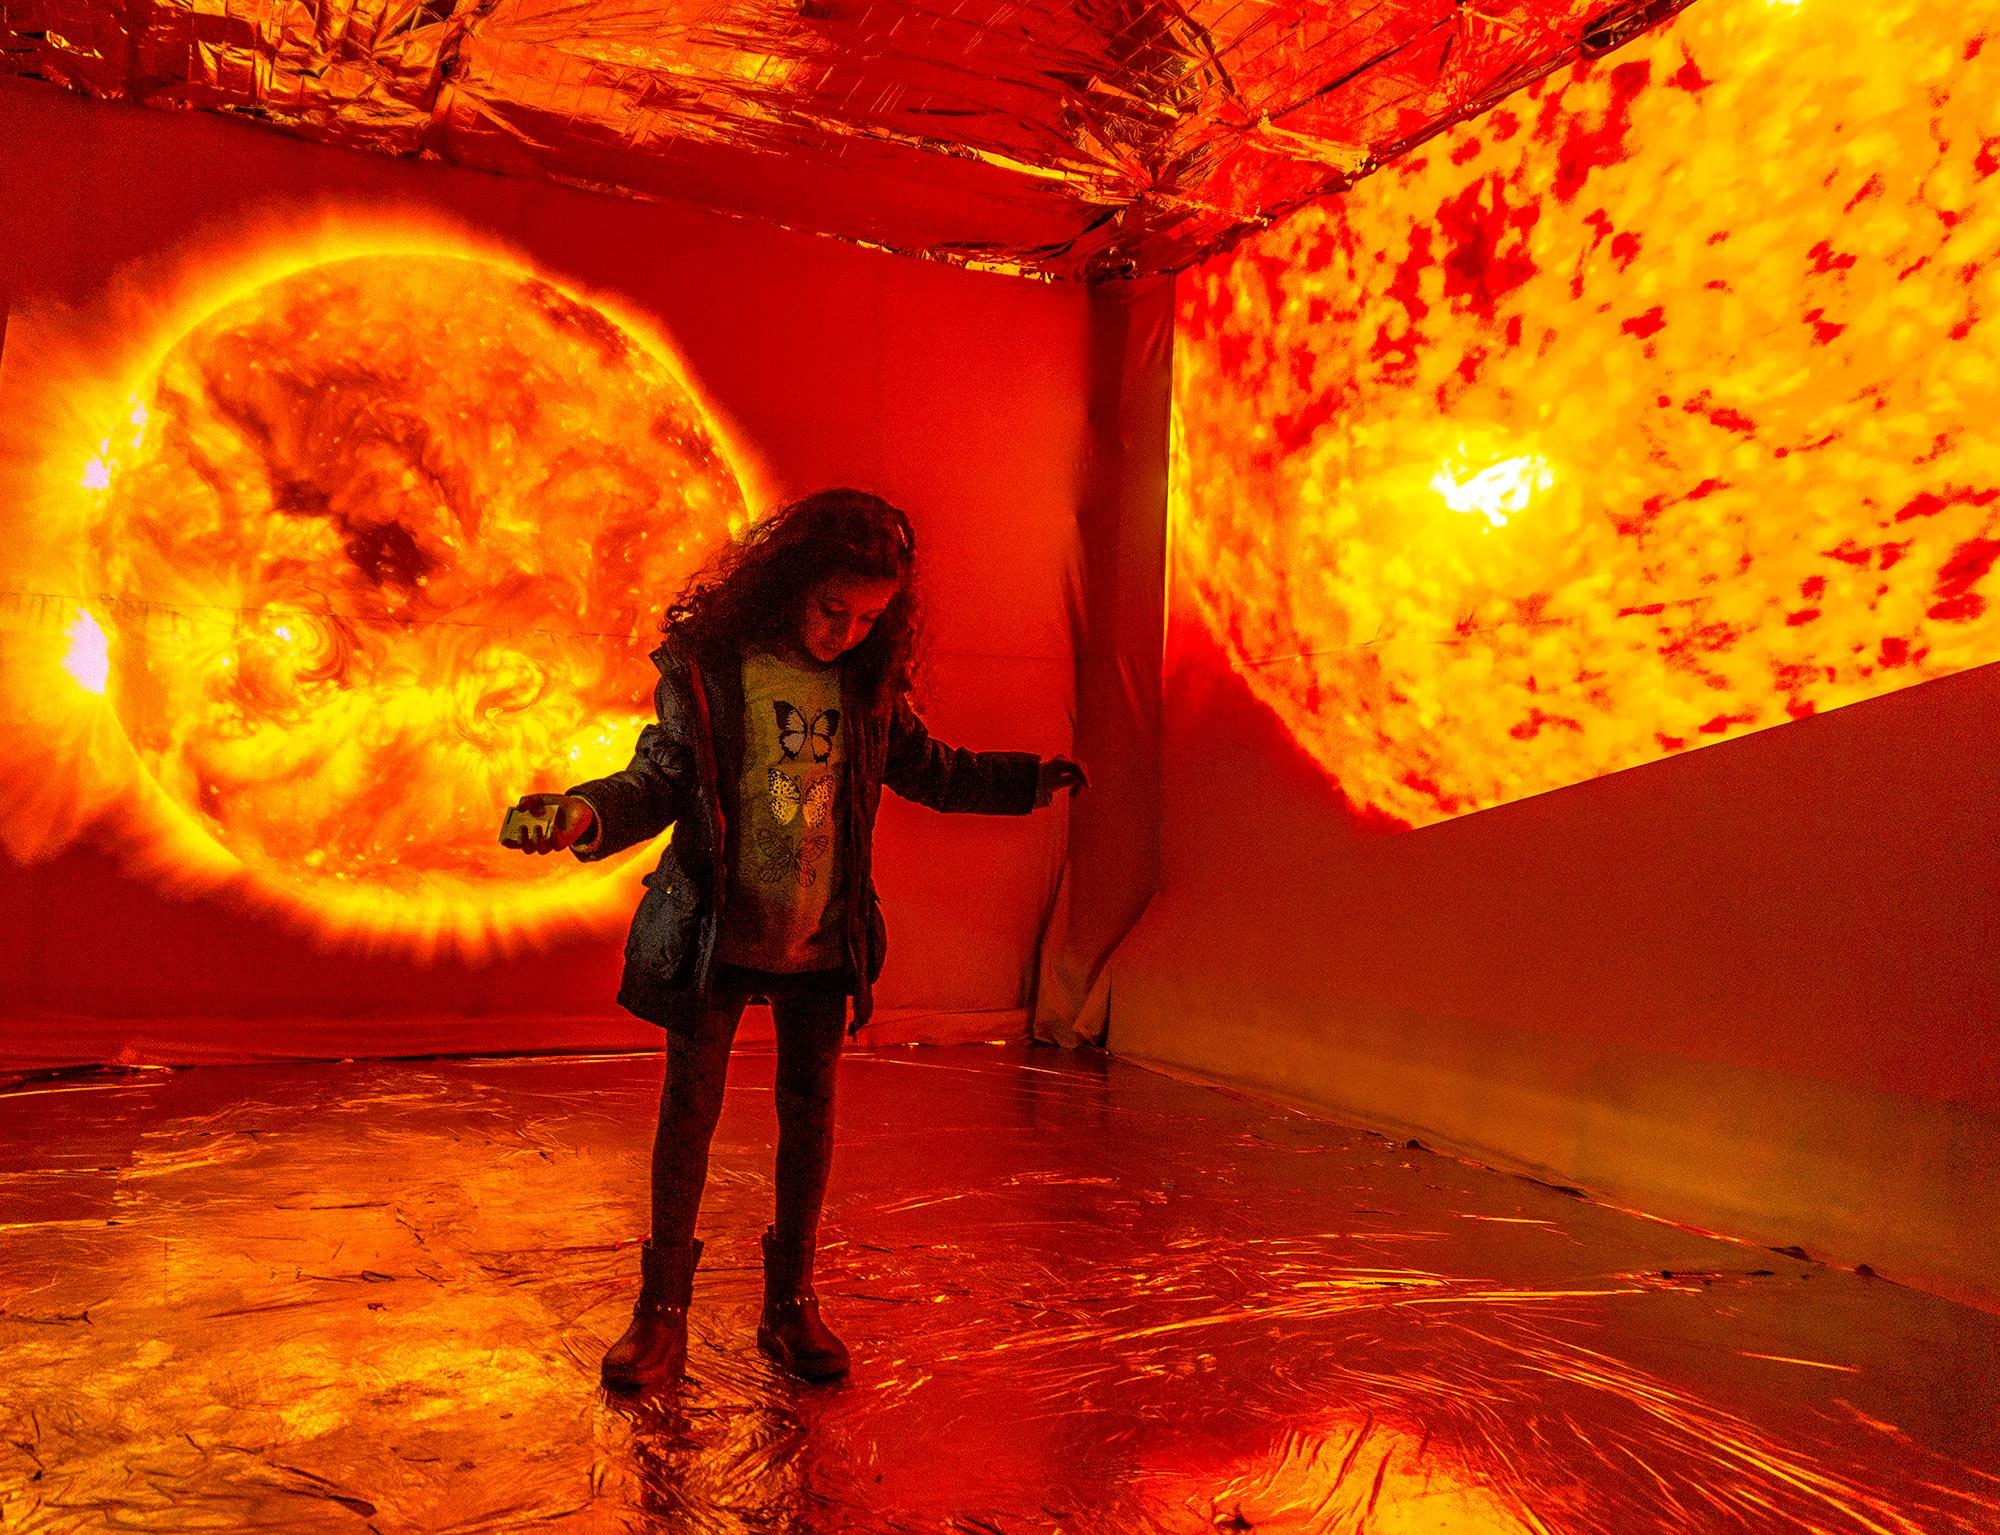 Sun installation Experiences Art Fair